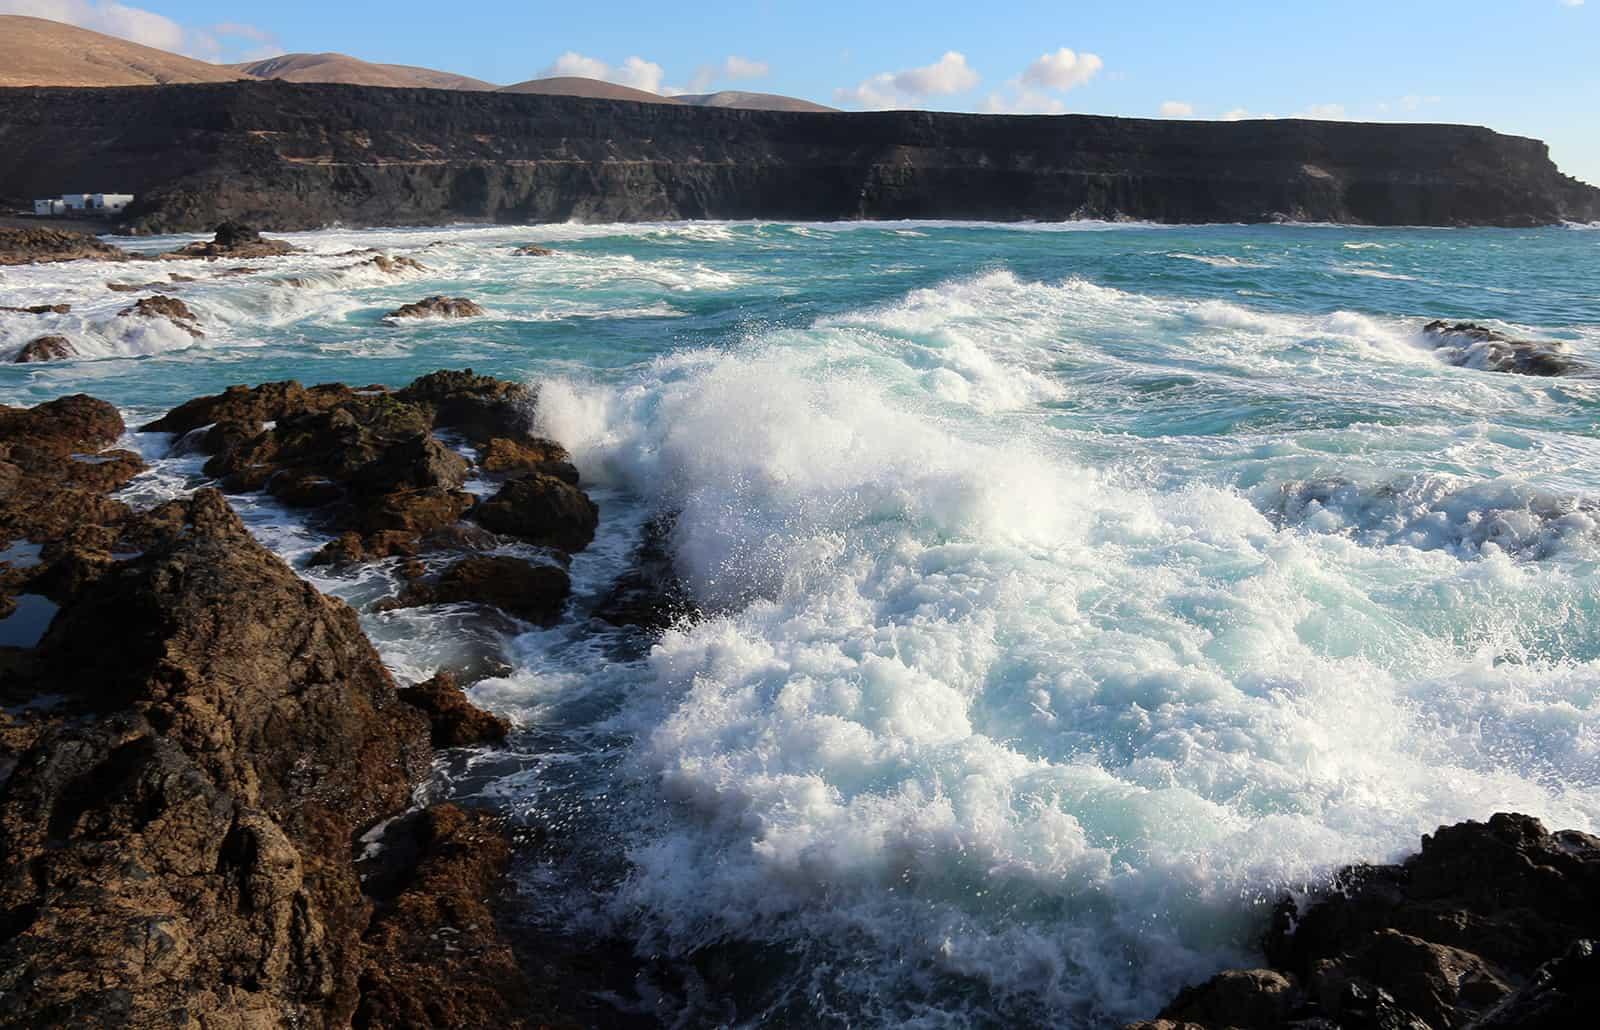 Sea and rocks.